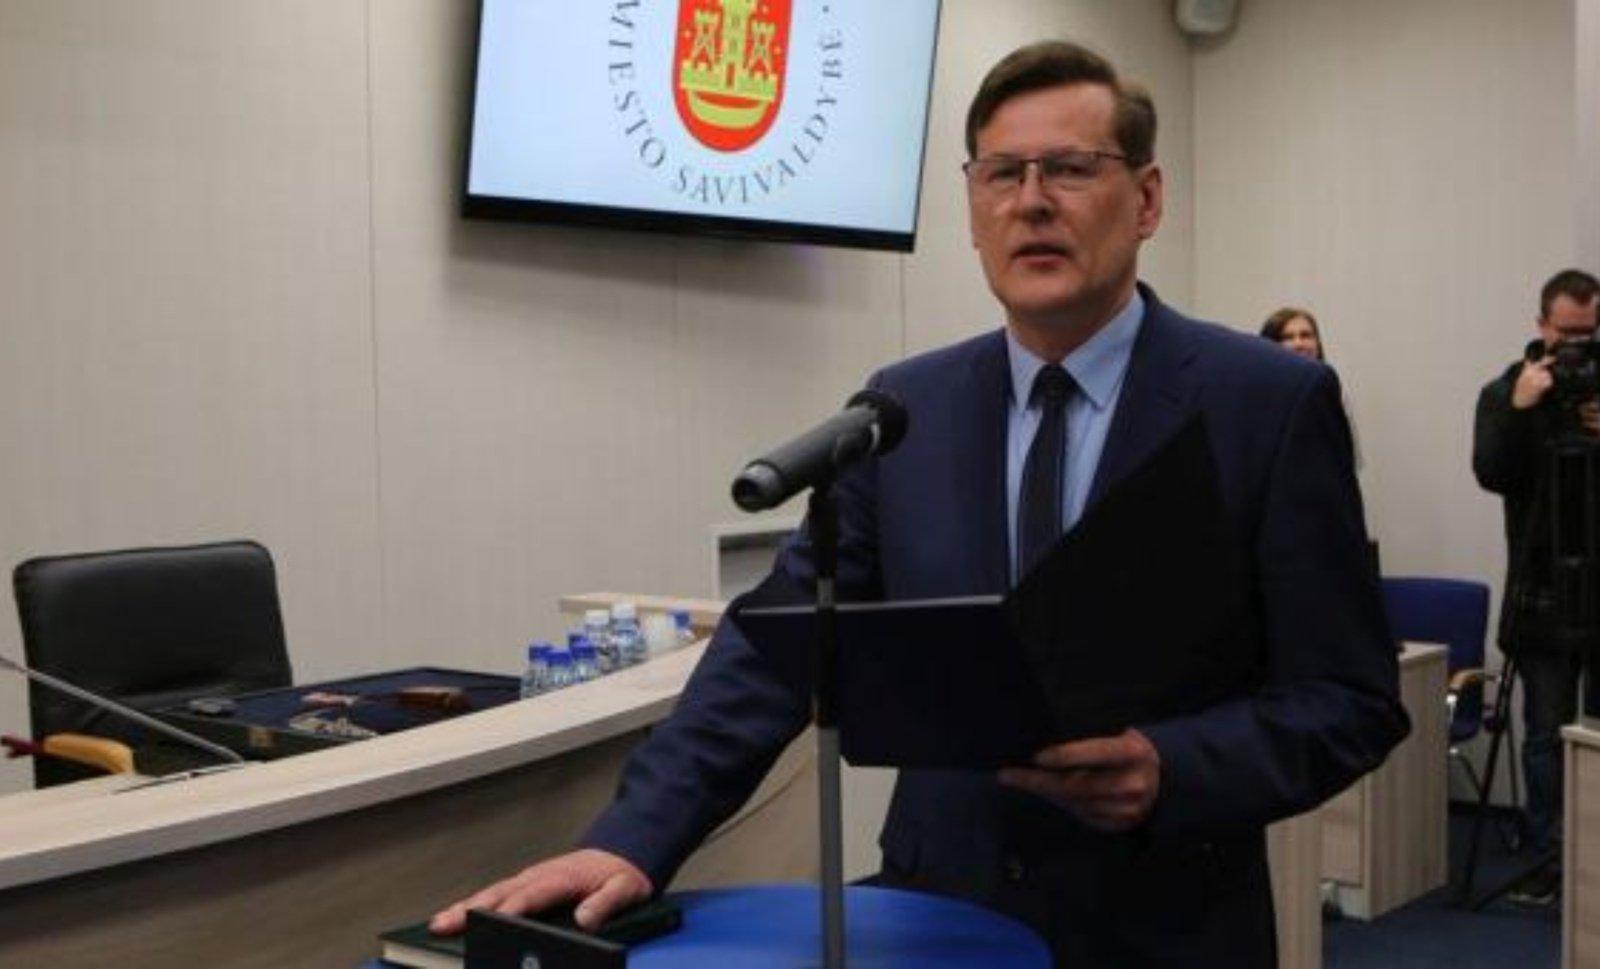 Klaipėdos opozicija inicijuoja nepasitikėjimą vicemeru A. Barbšiu